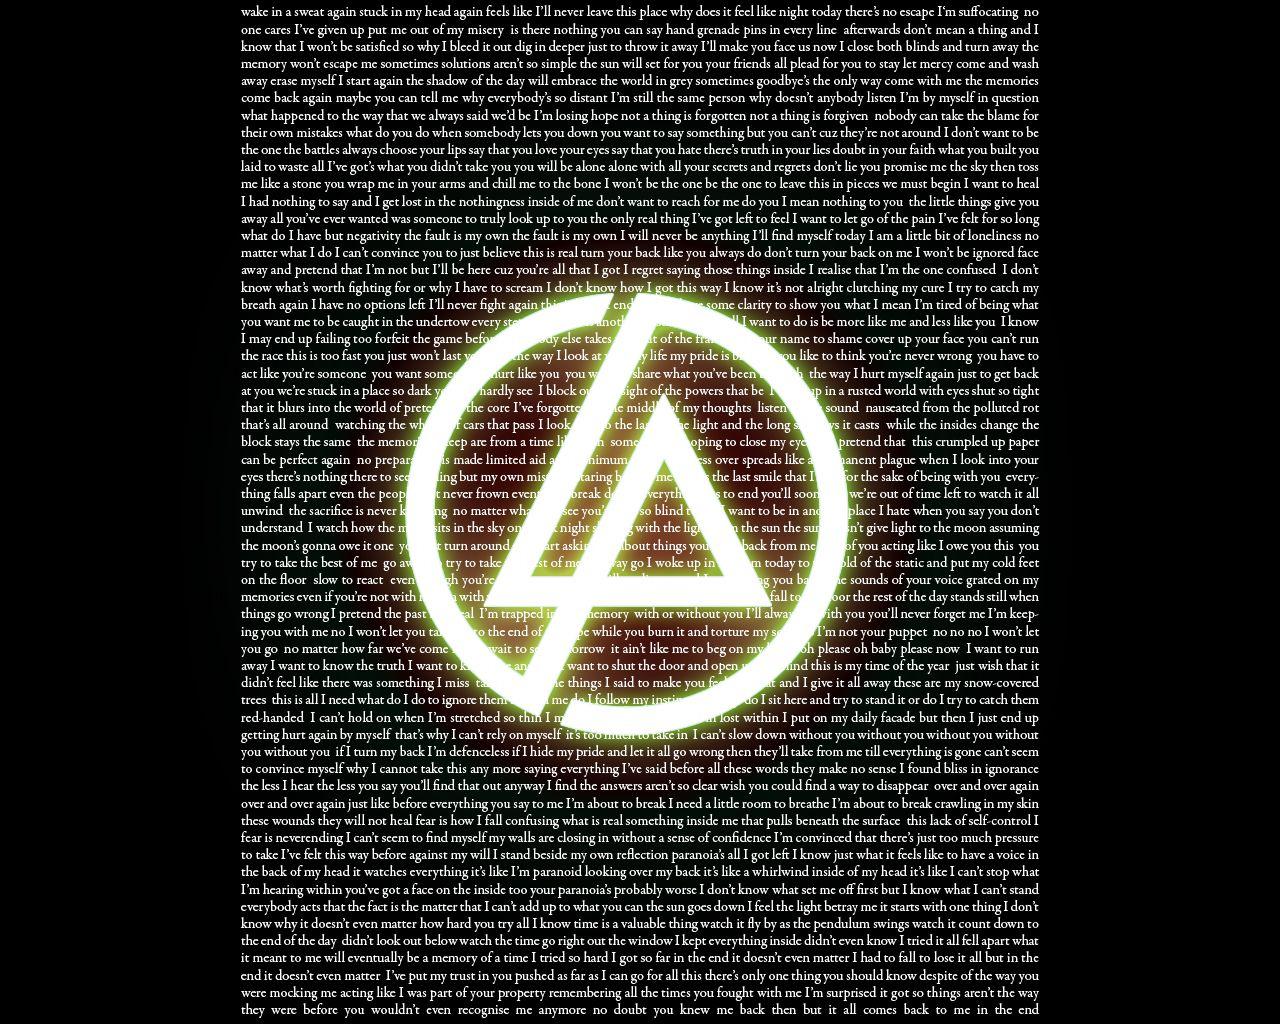 Wallpaper iphone linkin park - Undefined Linkin Park Backgrounds 49 Wallpapers Adorable Wallpapers